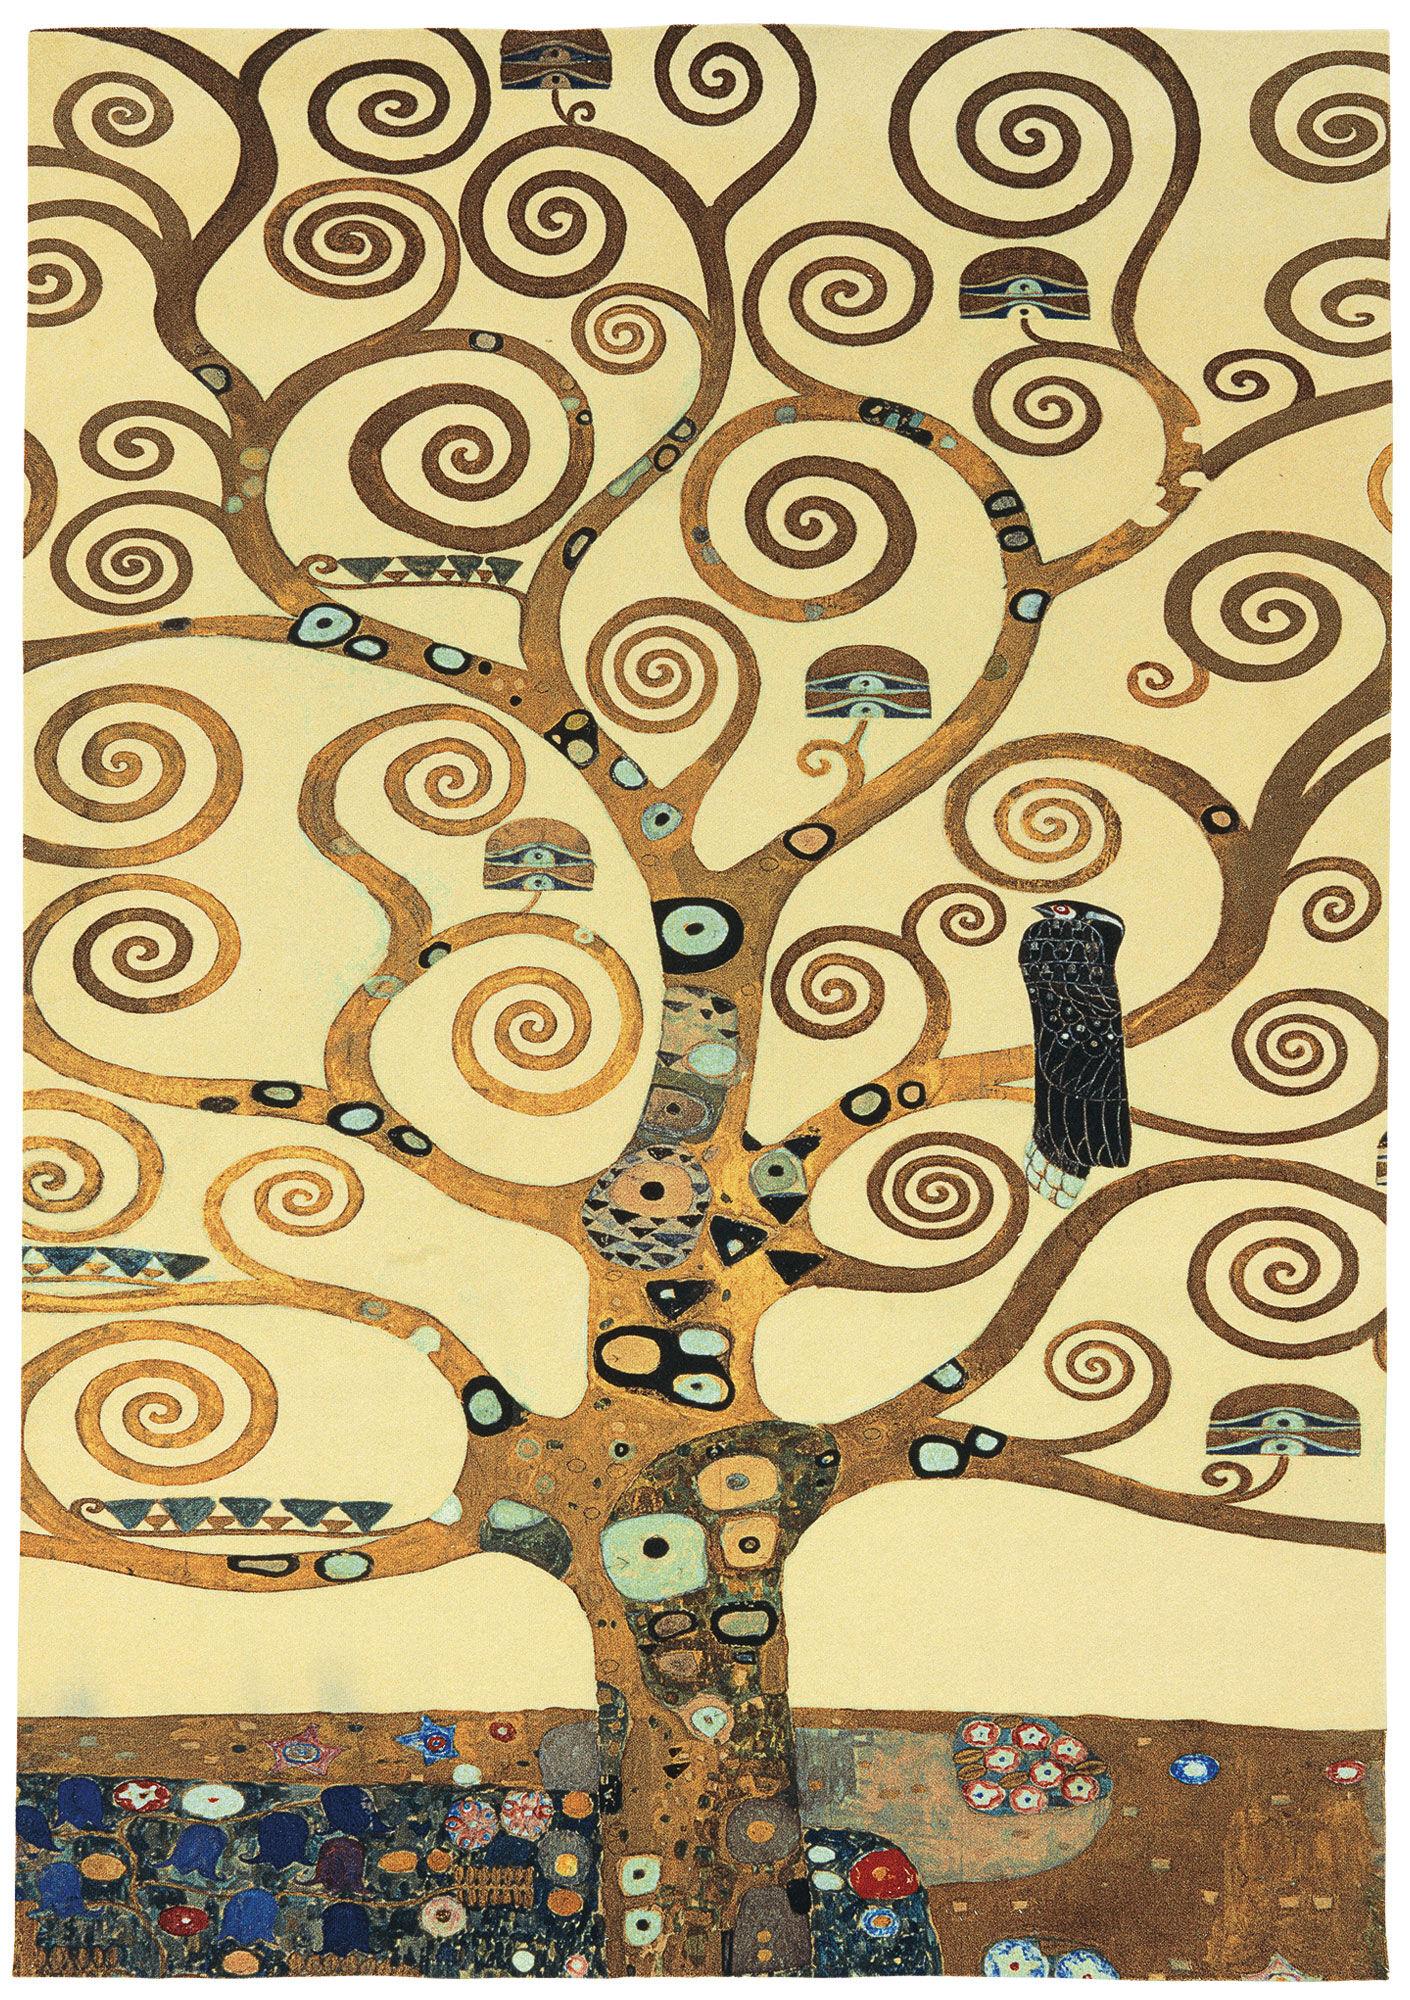 gustav klimt teppich lebensbaum eckig 230 x 160 cm ars mundi. Black Bedroom Furniture Sets. Home Design Ideas